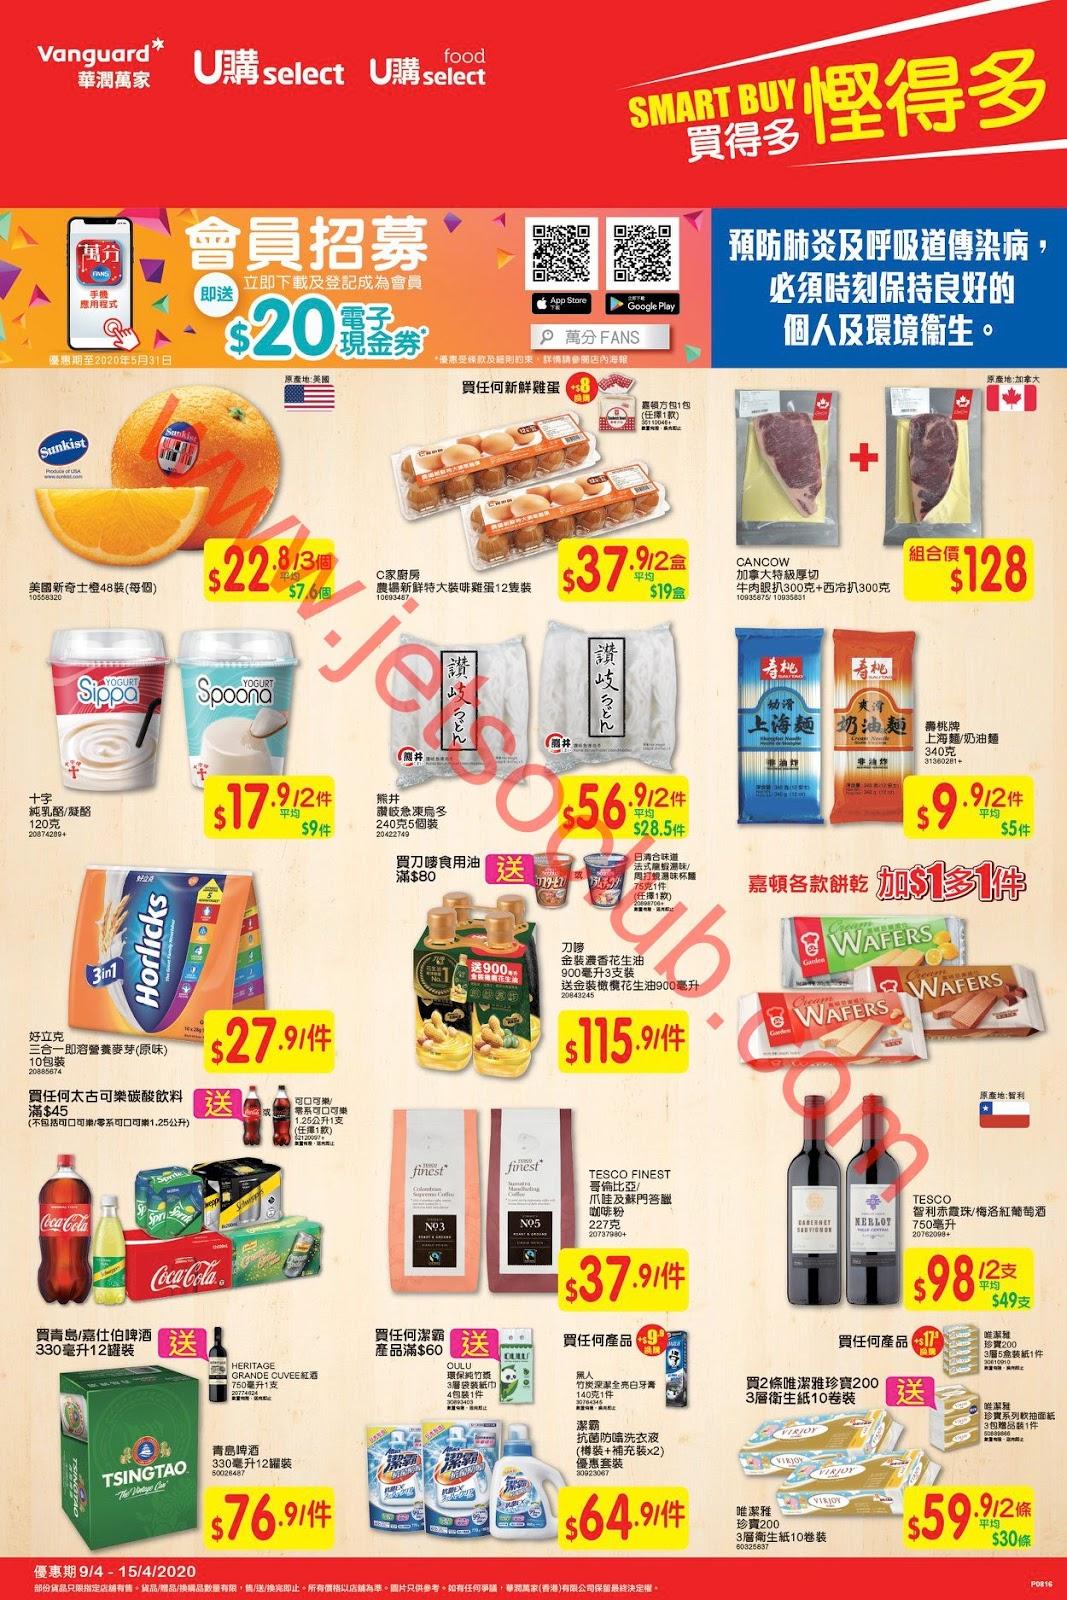 U購 select / 華潤萬家超級市場最新優惠(10/4) ( Jetso Club 著數俱樂部 )